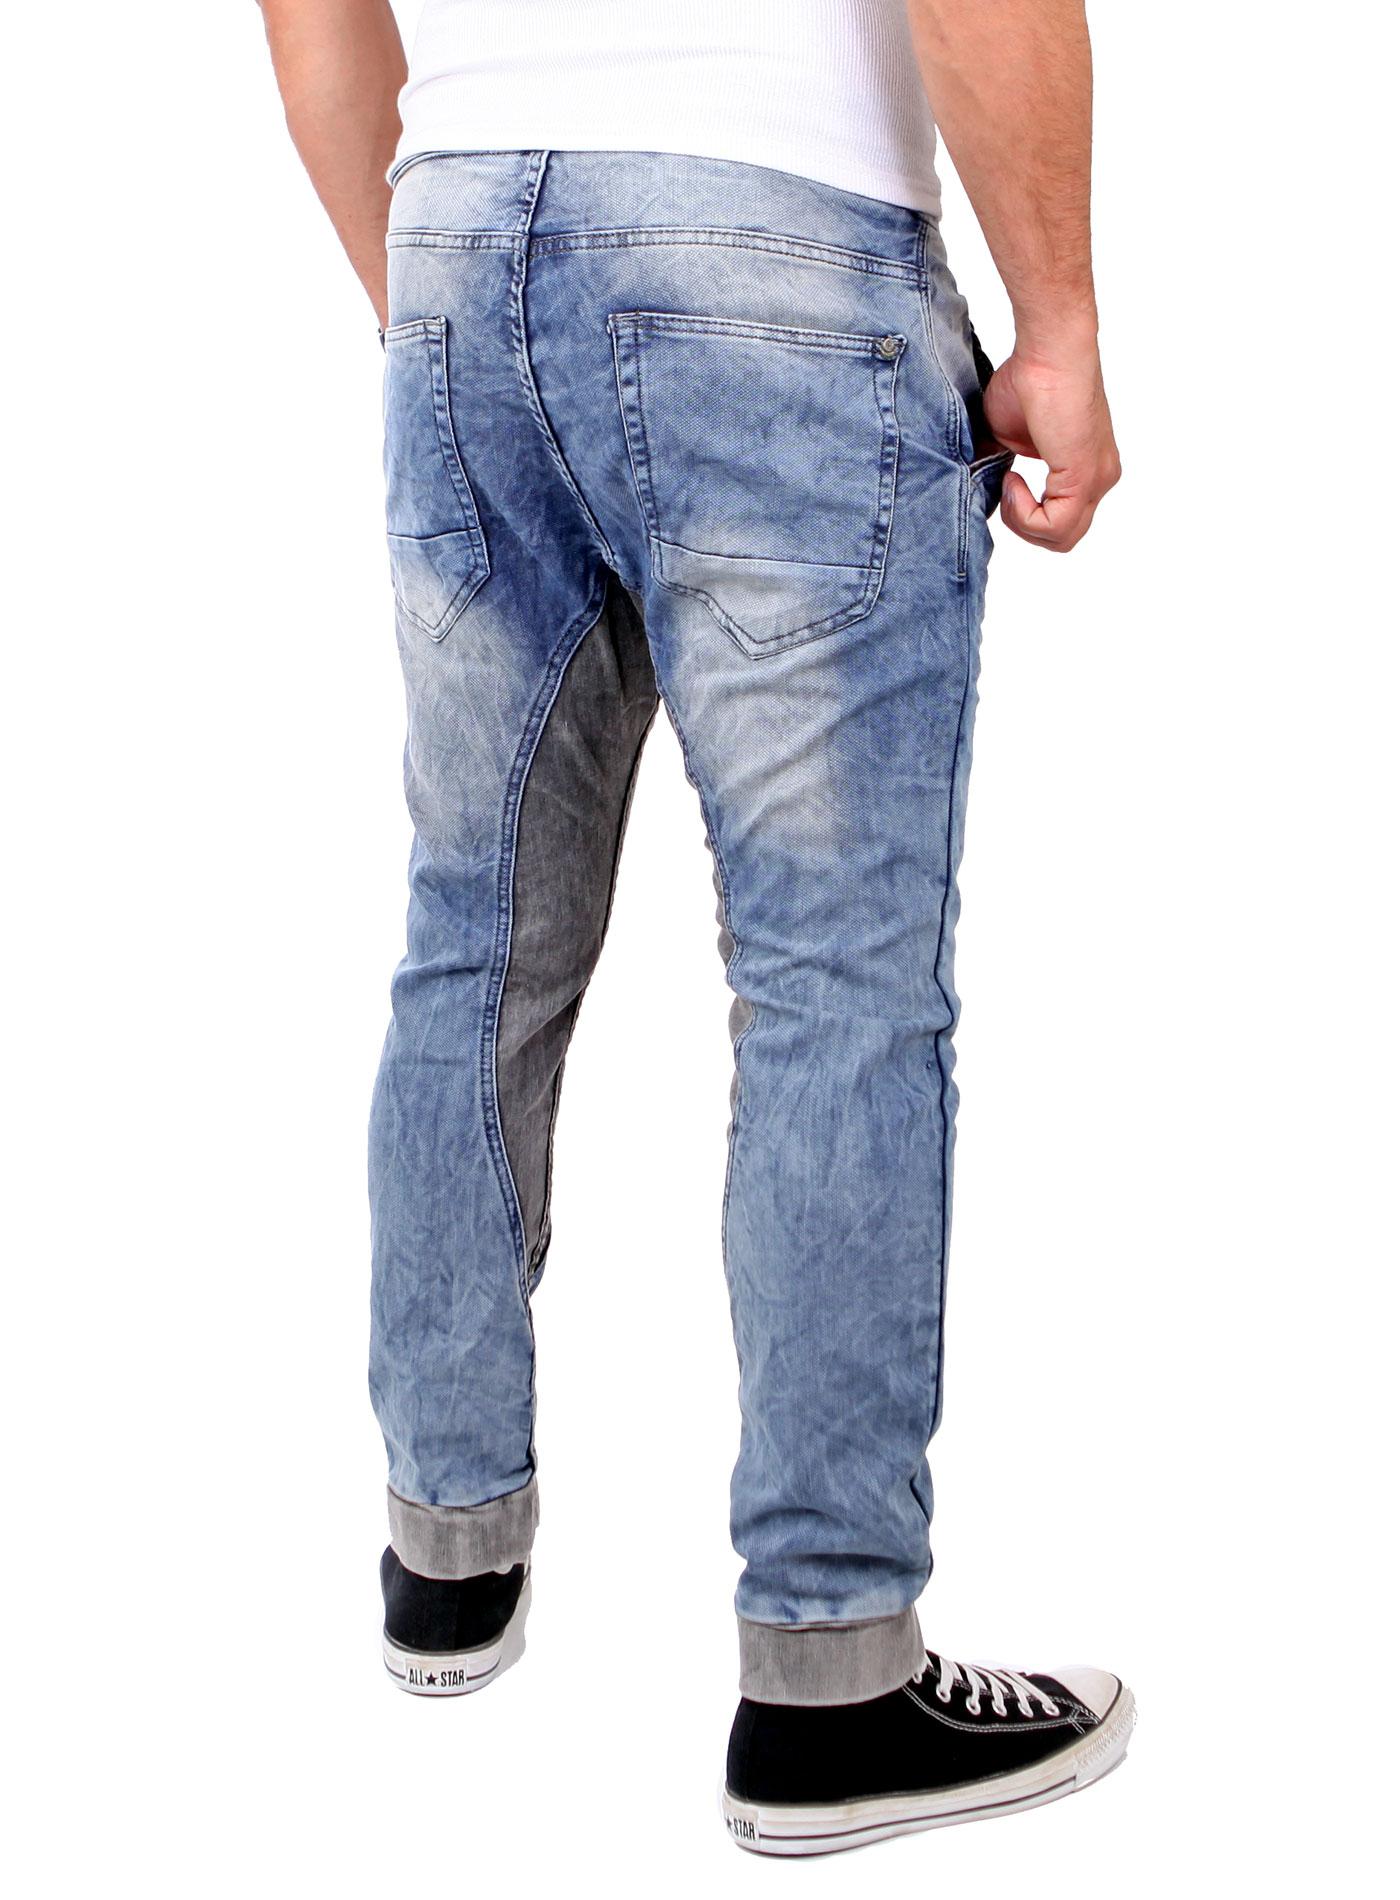 rerock herren jeans jogginghose bicolor low crotch jogg. Black Bedroom Furniture Sets. Home Design Ideas